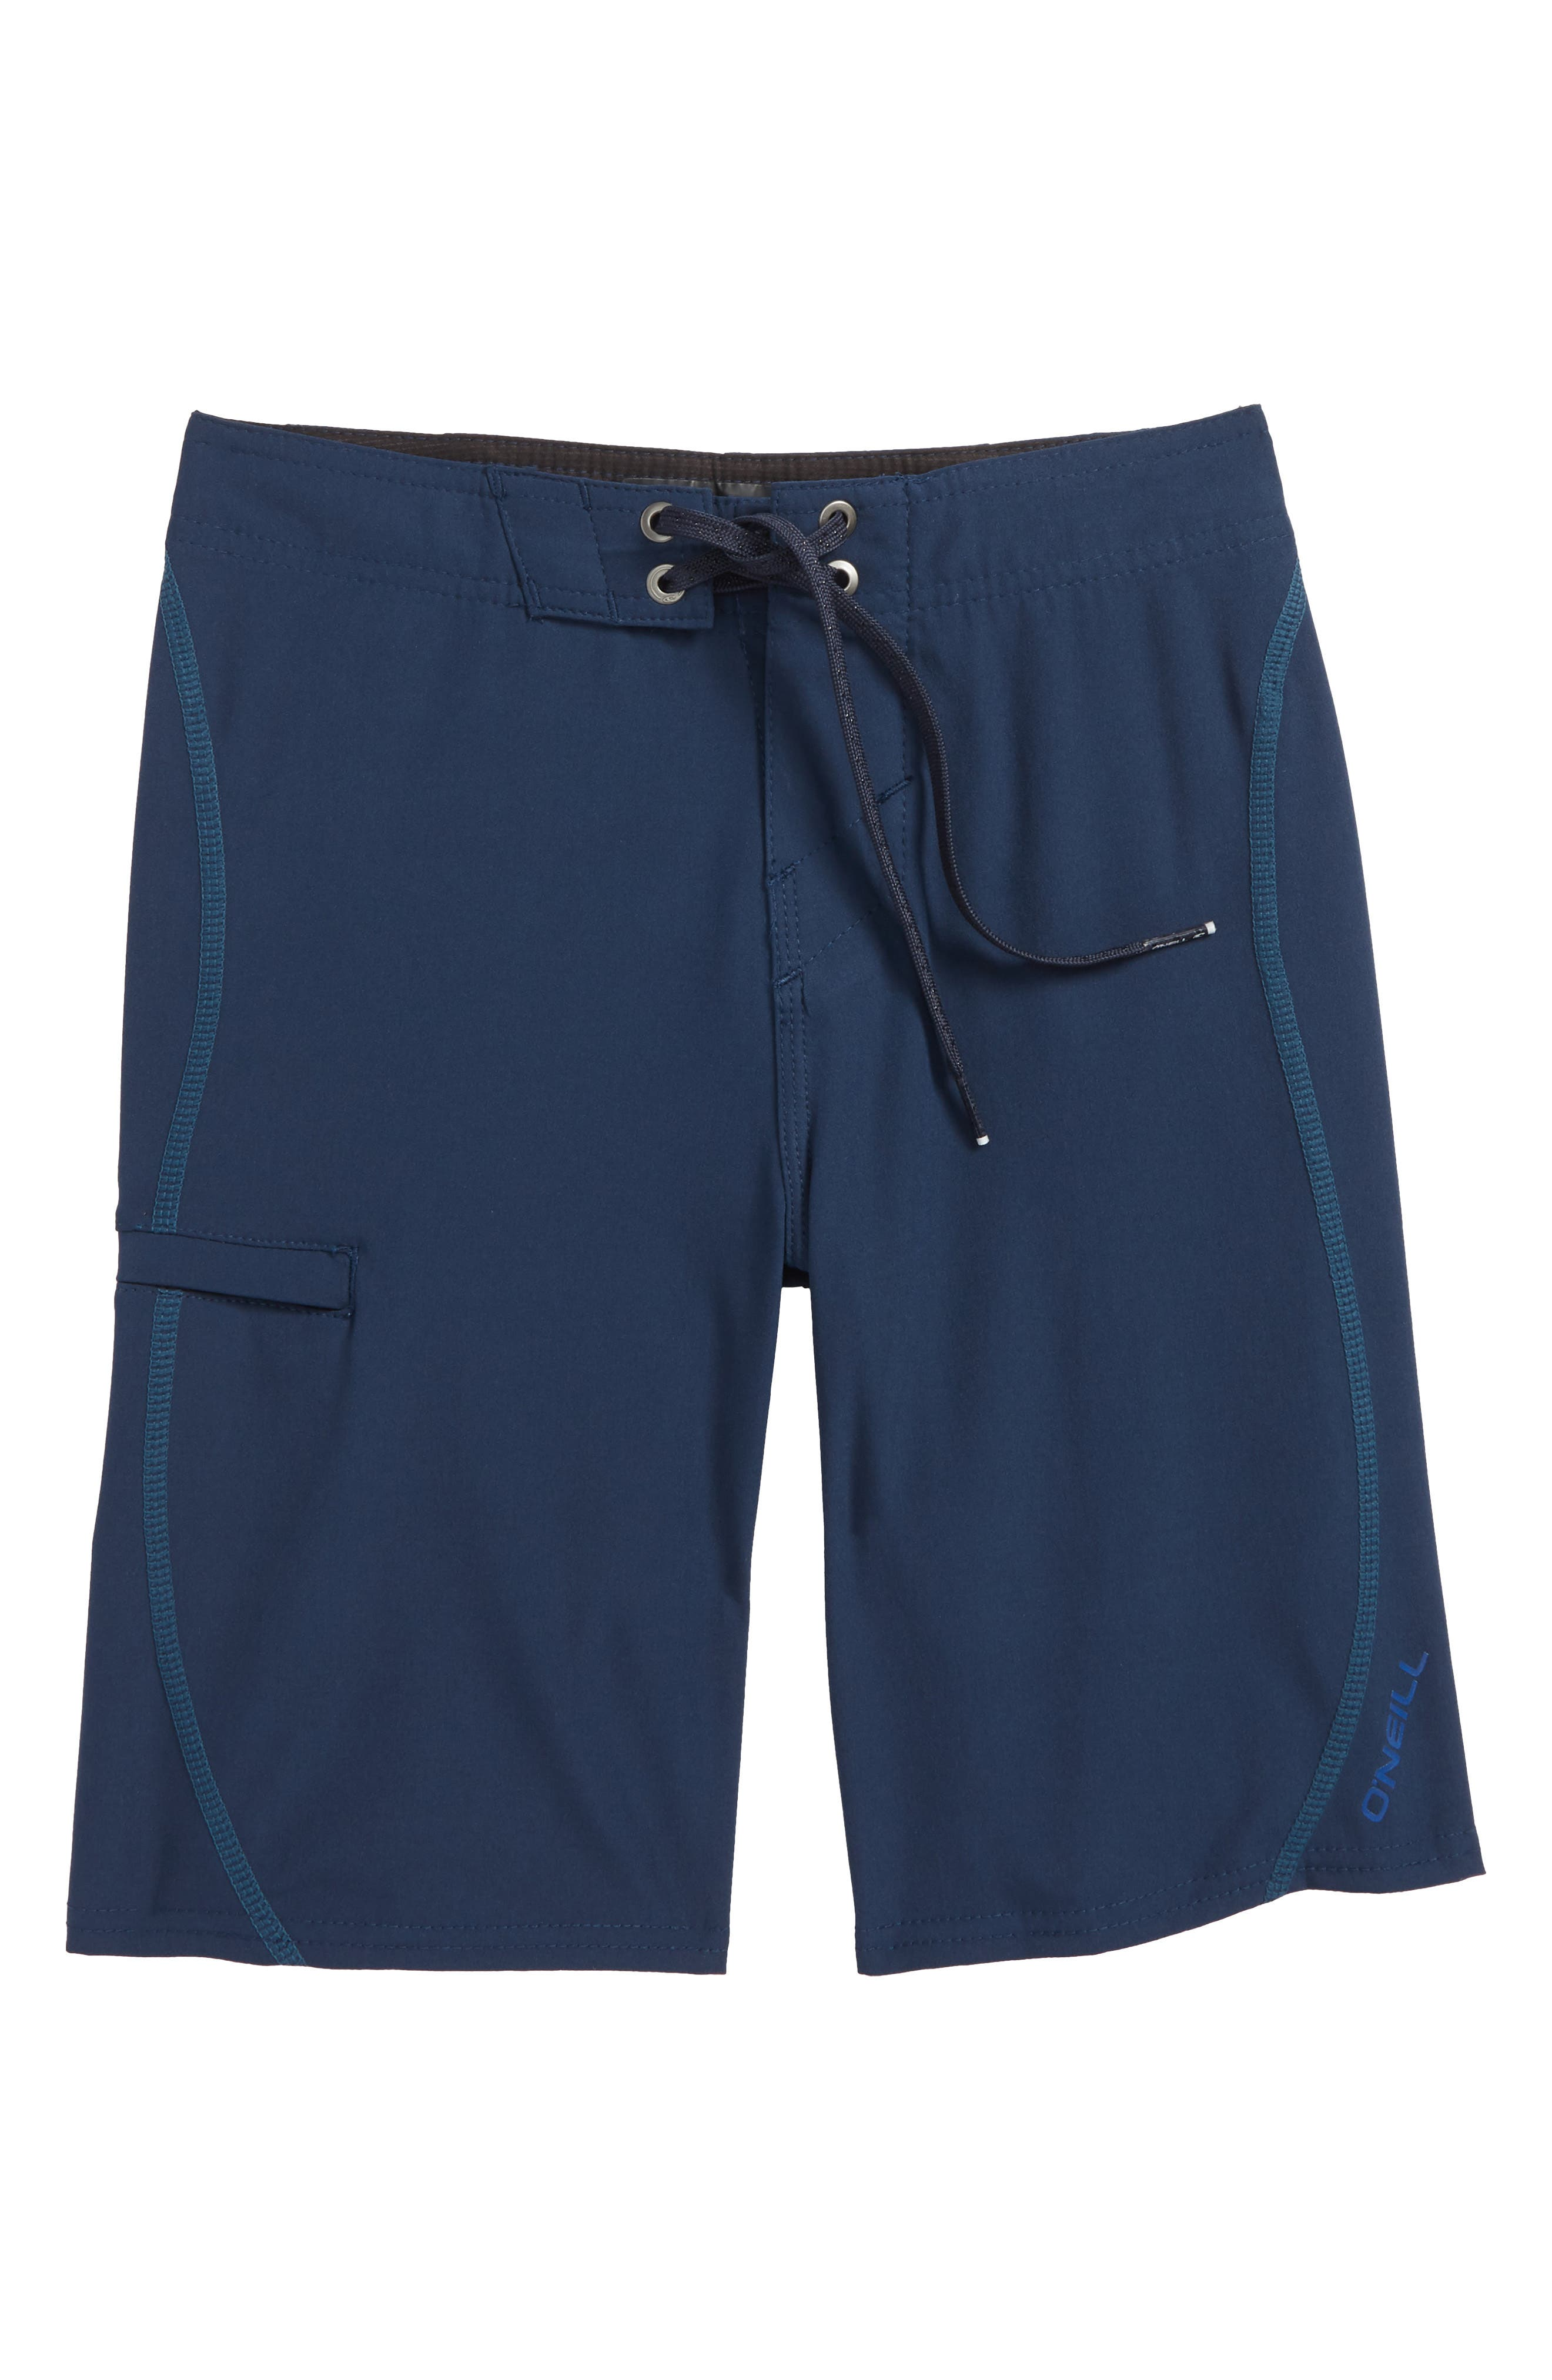 Hyperfreak S-Seam Stretch Print Board Shorts,                         Main,                         color, Navy